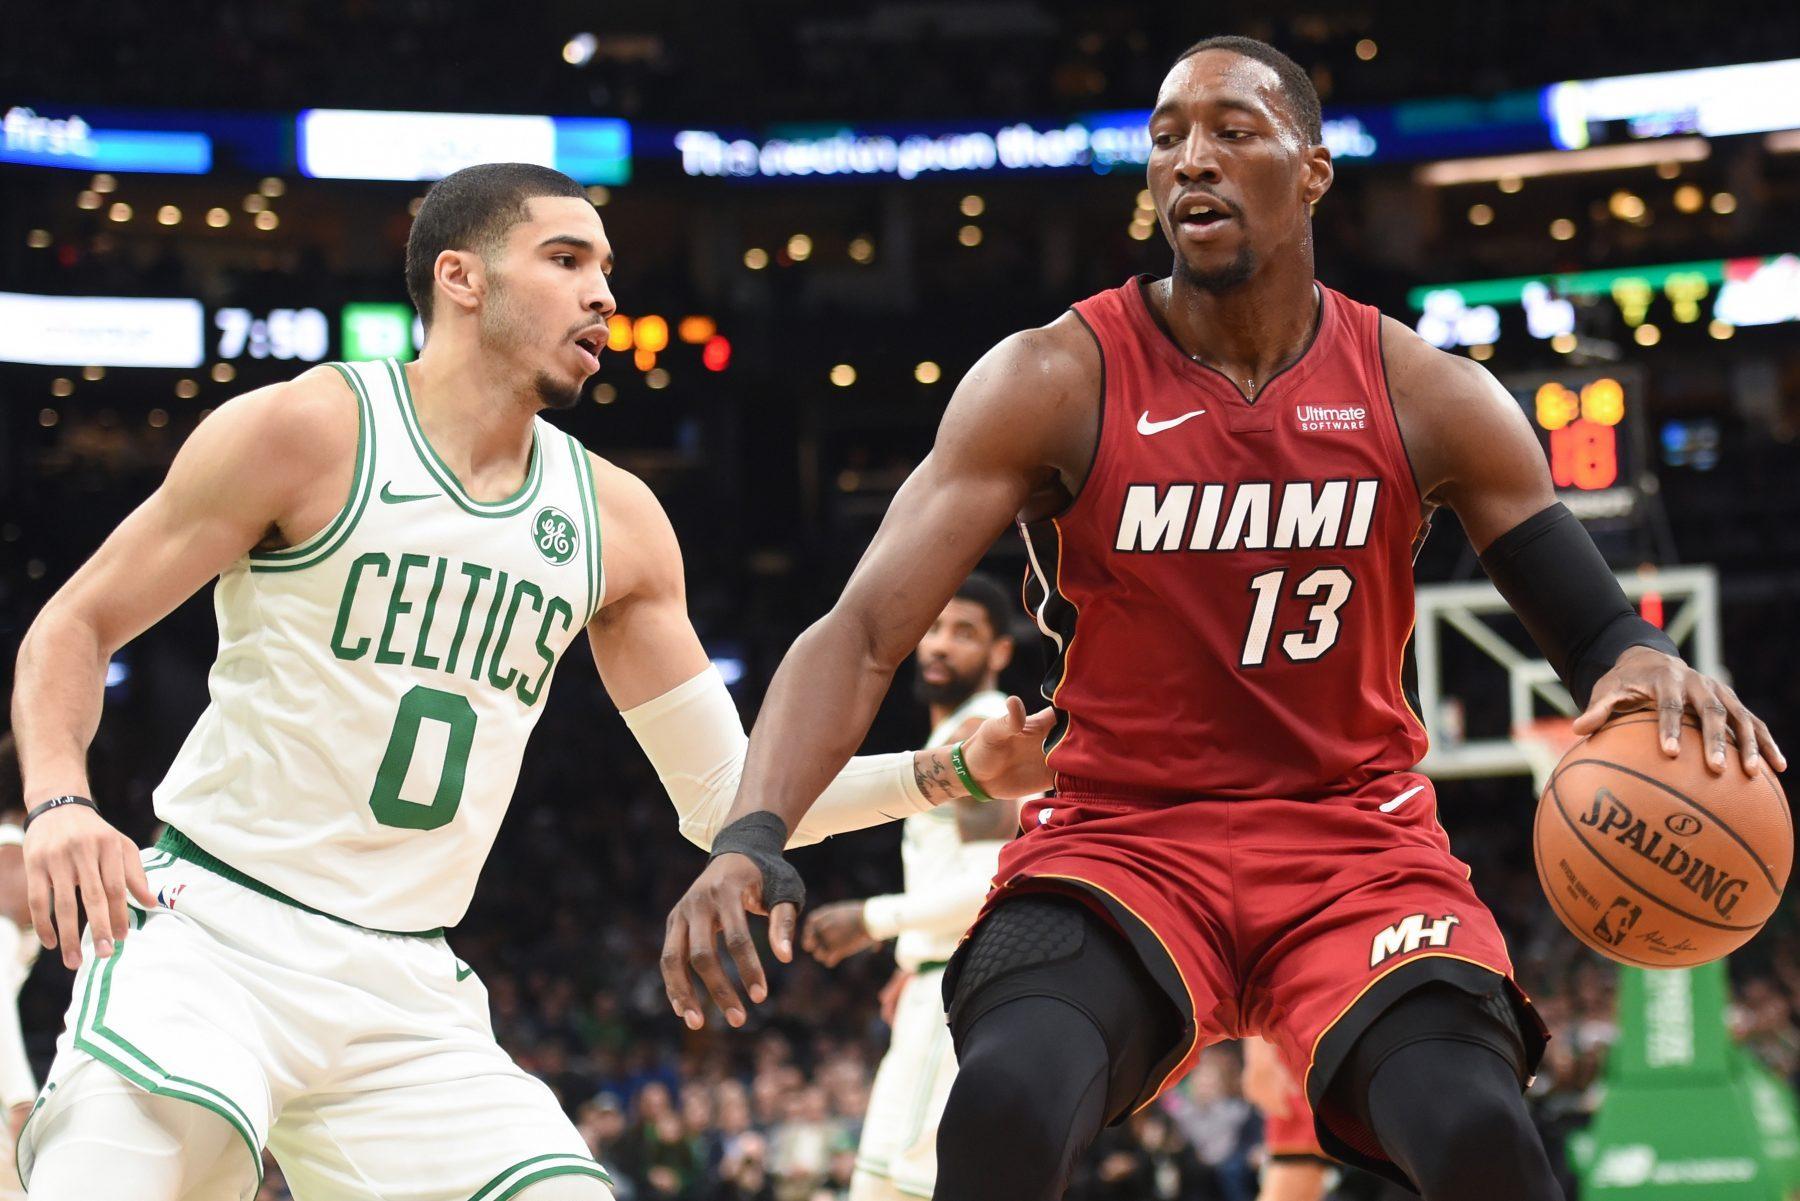 Bam Adebayo and Jayson Tatum Exchange Trash Talk After Miami Heat Loss vs.  Boston Celtics - Heat Nation